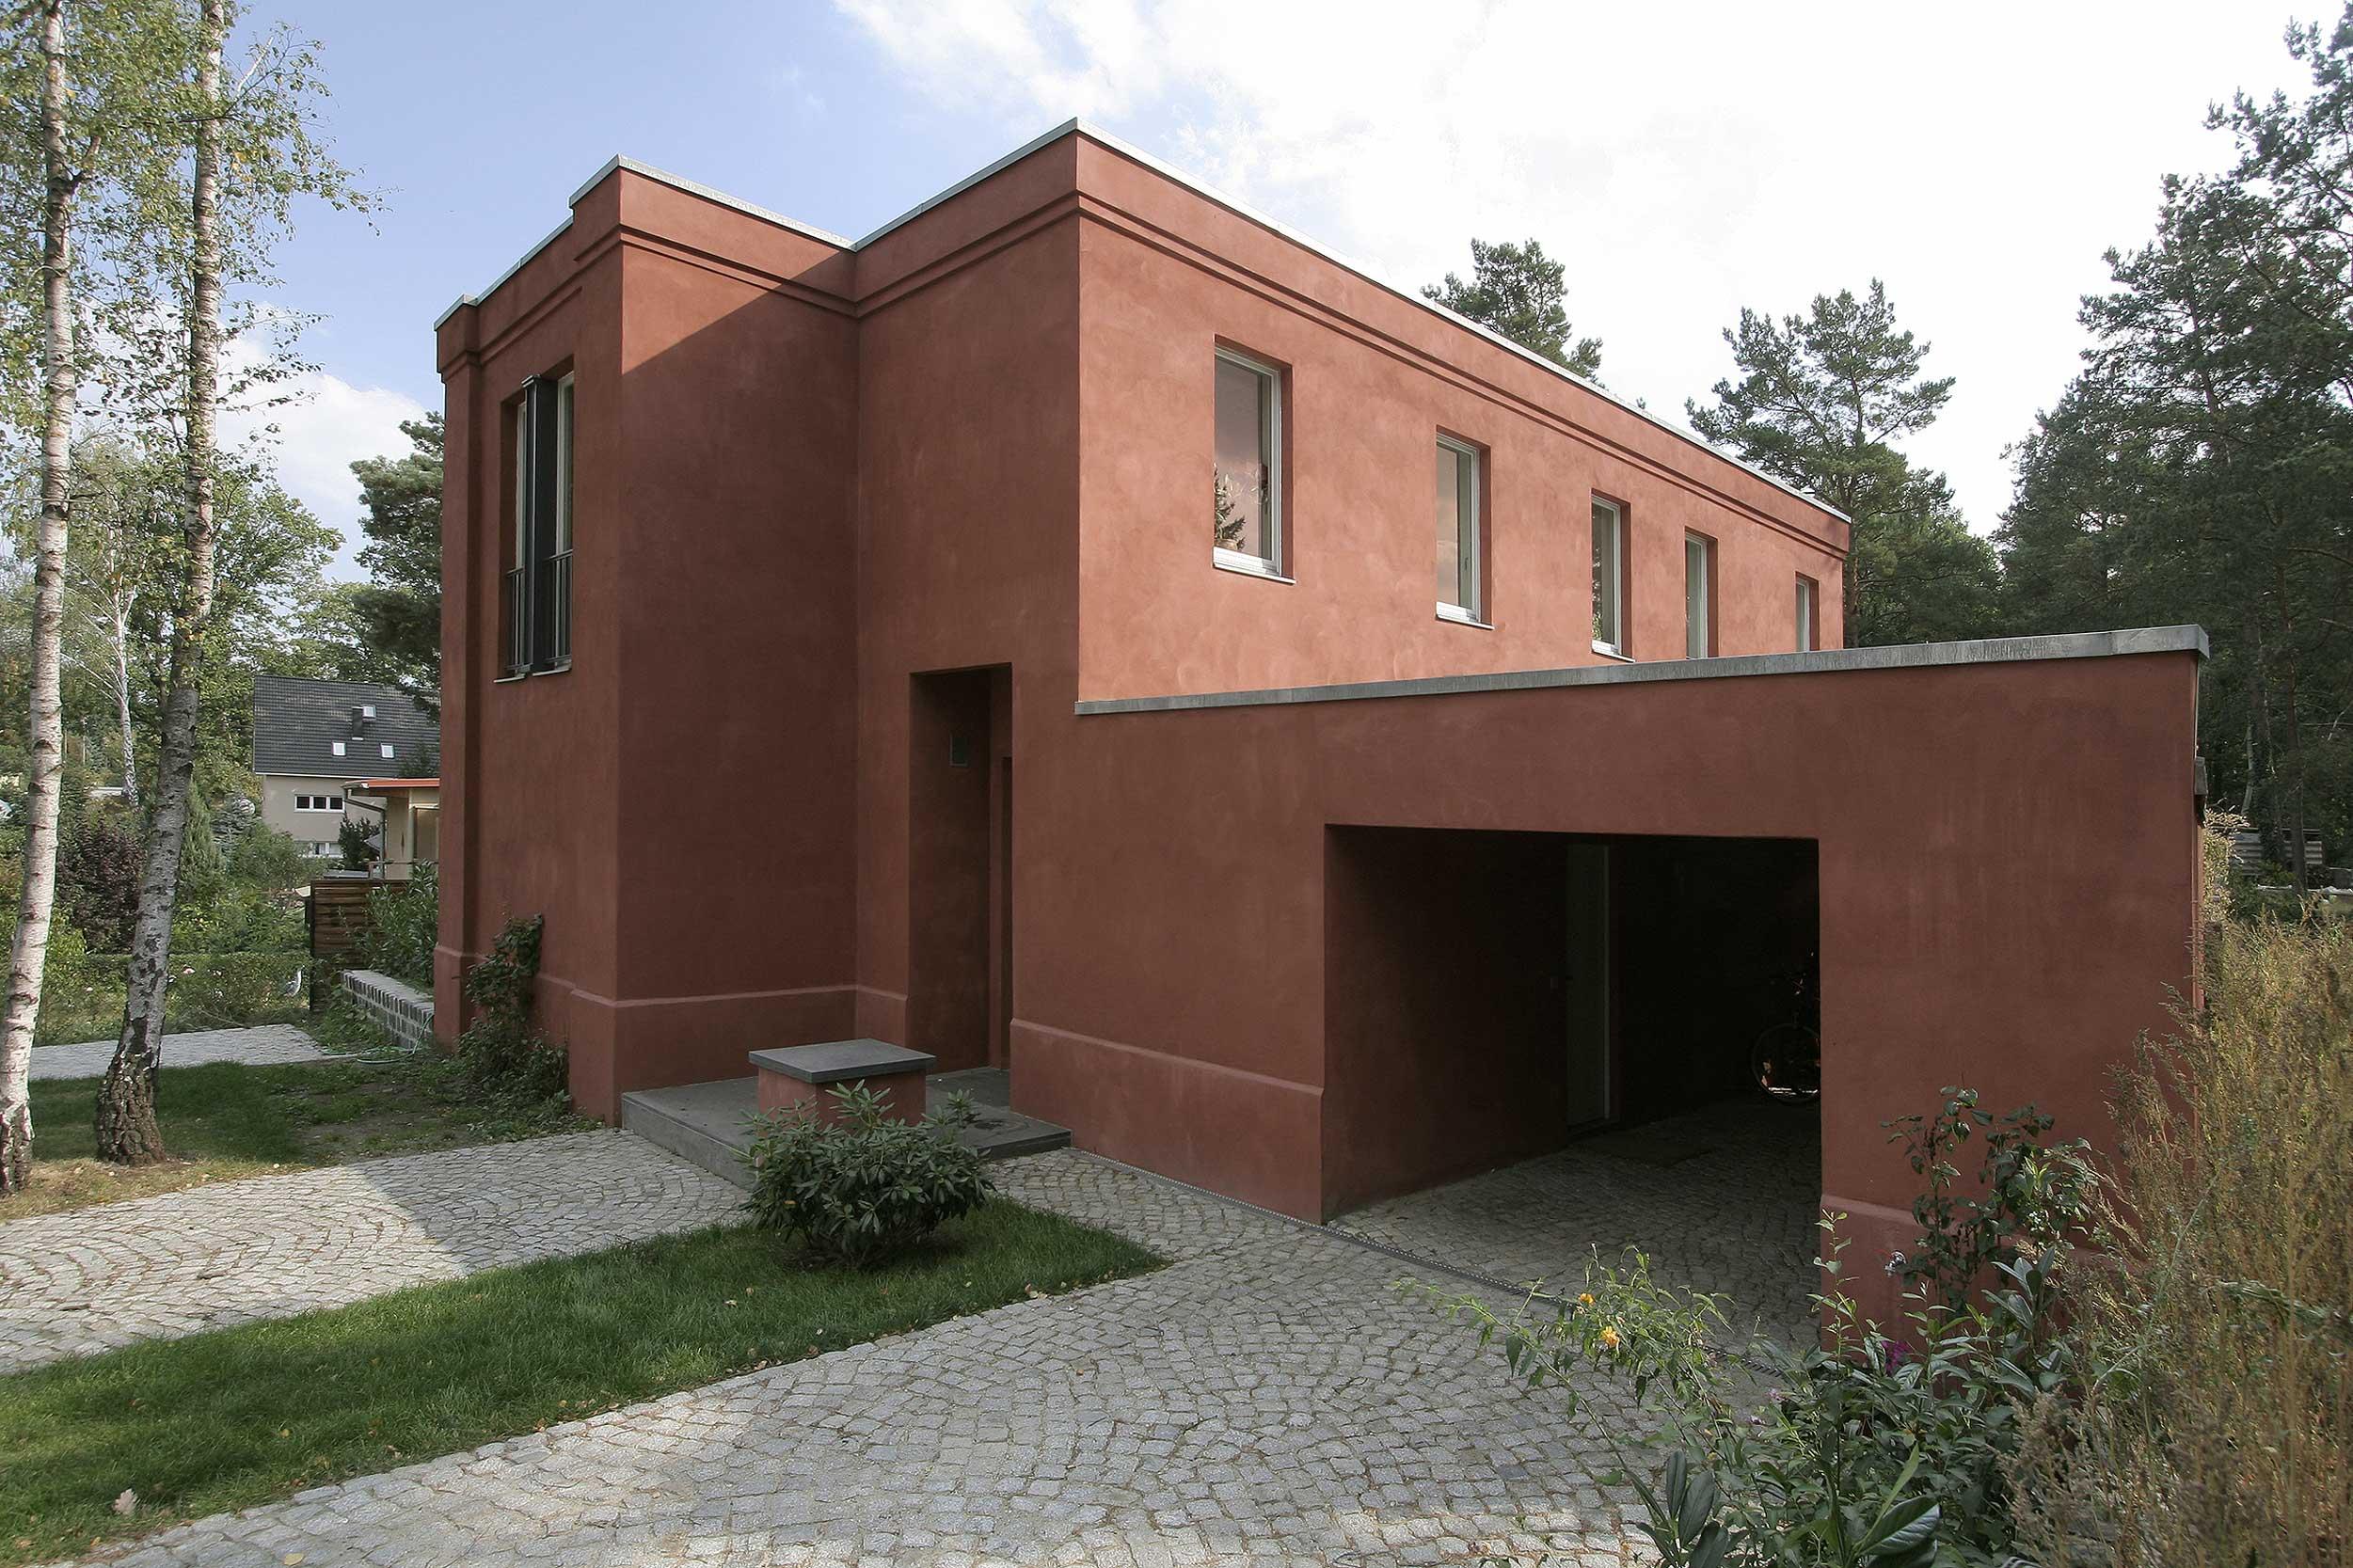 Neubau eines klassischen hauses in bewaldeter umgebung for Haus bauen berlin